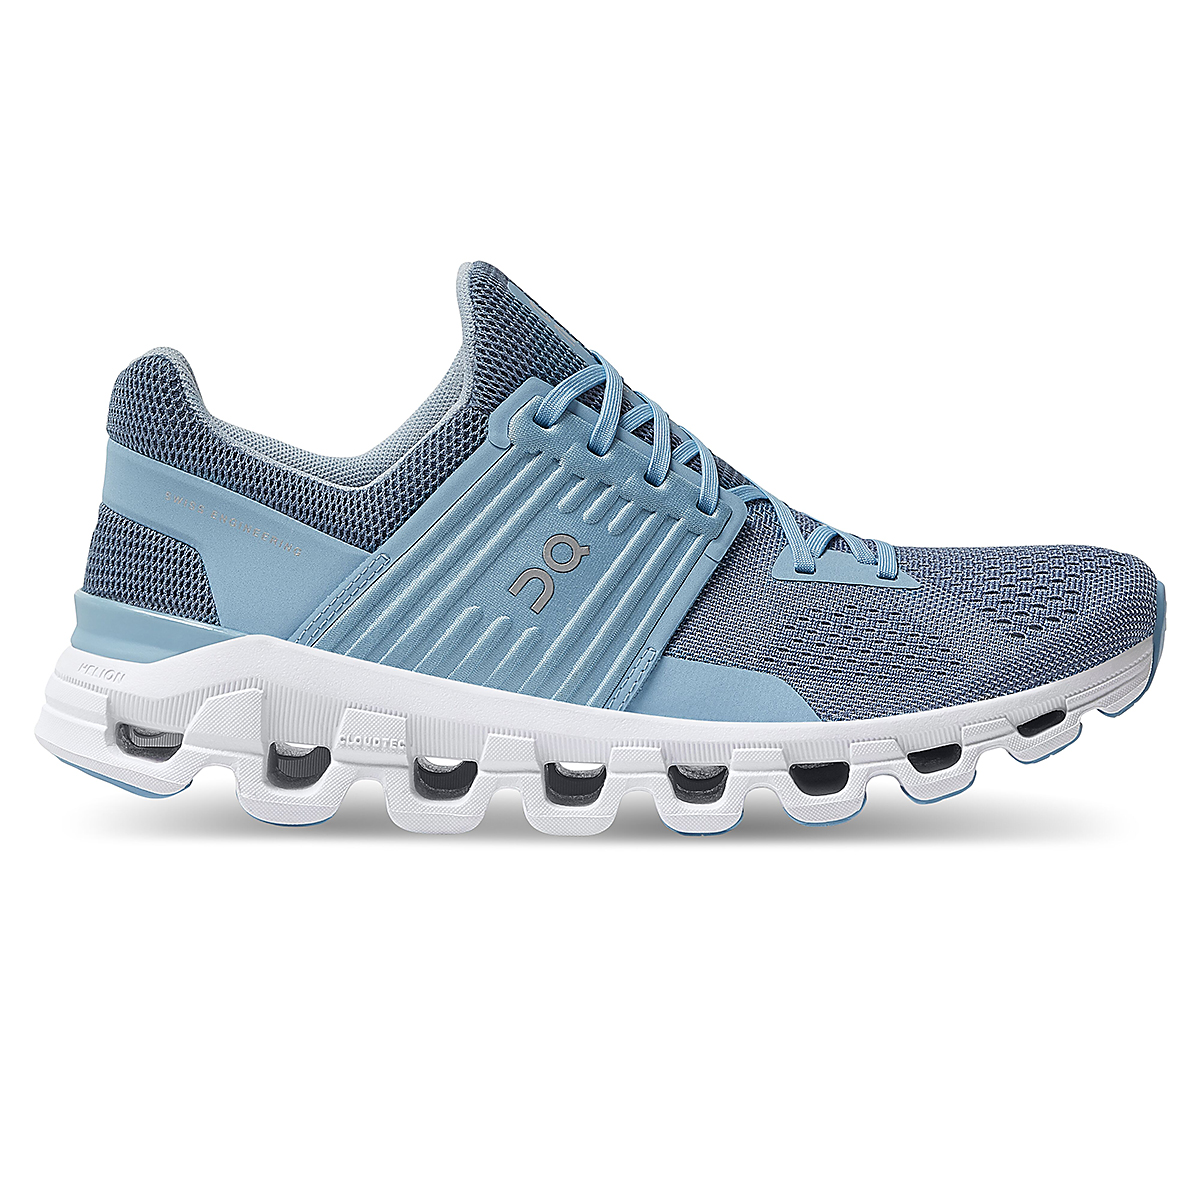 Women's On Cloudswift 2.0 Running Shoe - Color: Lake/Sky - Size: 5 - Width: Regular, Lake/Sky, large, image 1